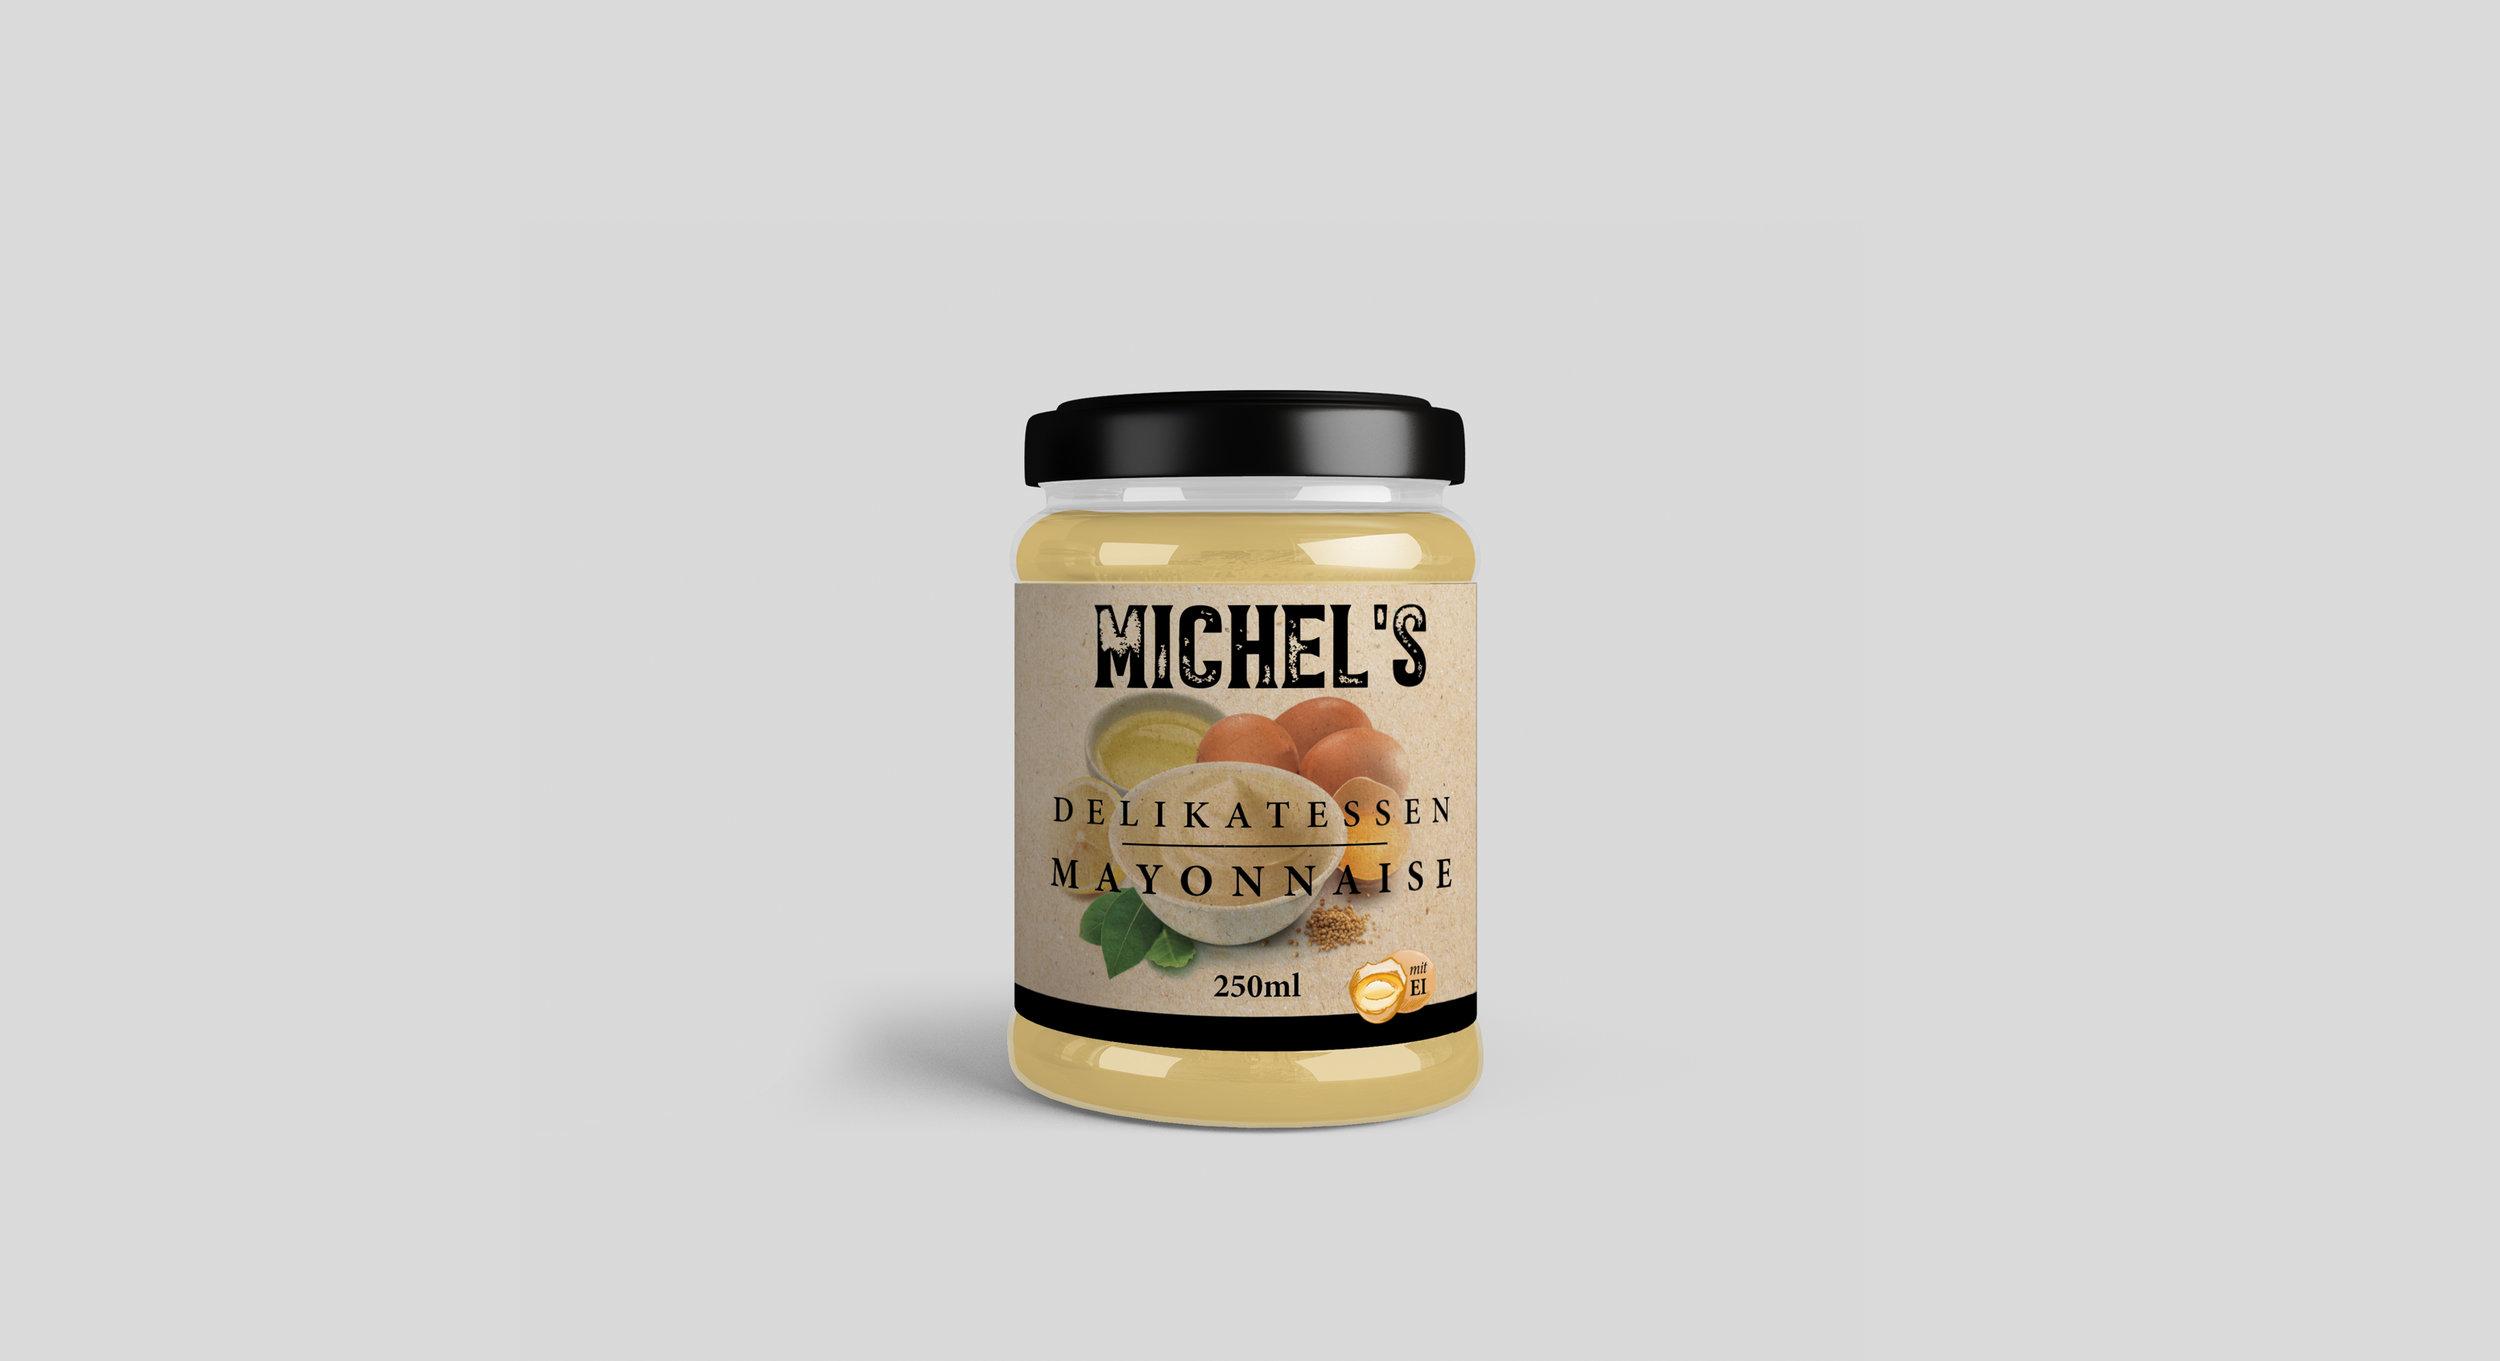 02900218_Michels_Logo_Design_Packaging_Mayonnaise_Jar_2.jpg